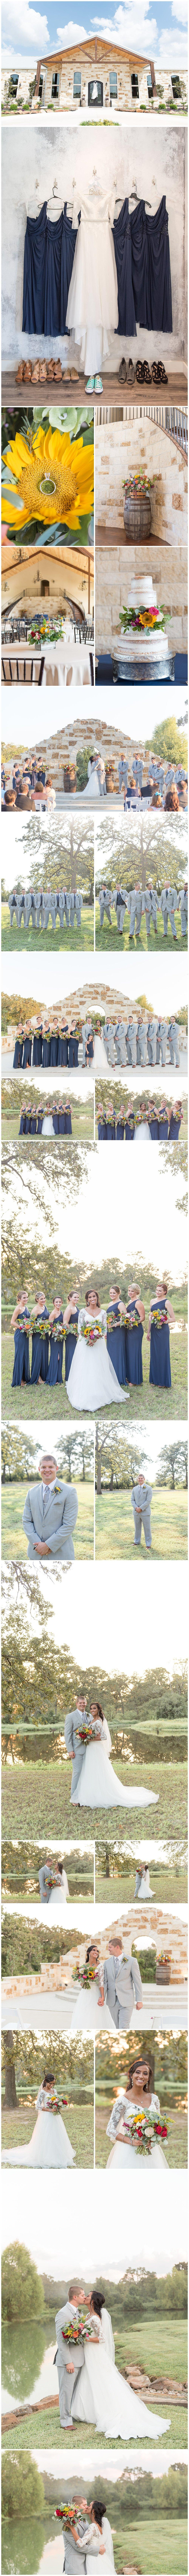 Brownstone Reserve Wedding   Bryan, TX   Katelyn Todd Photography